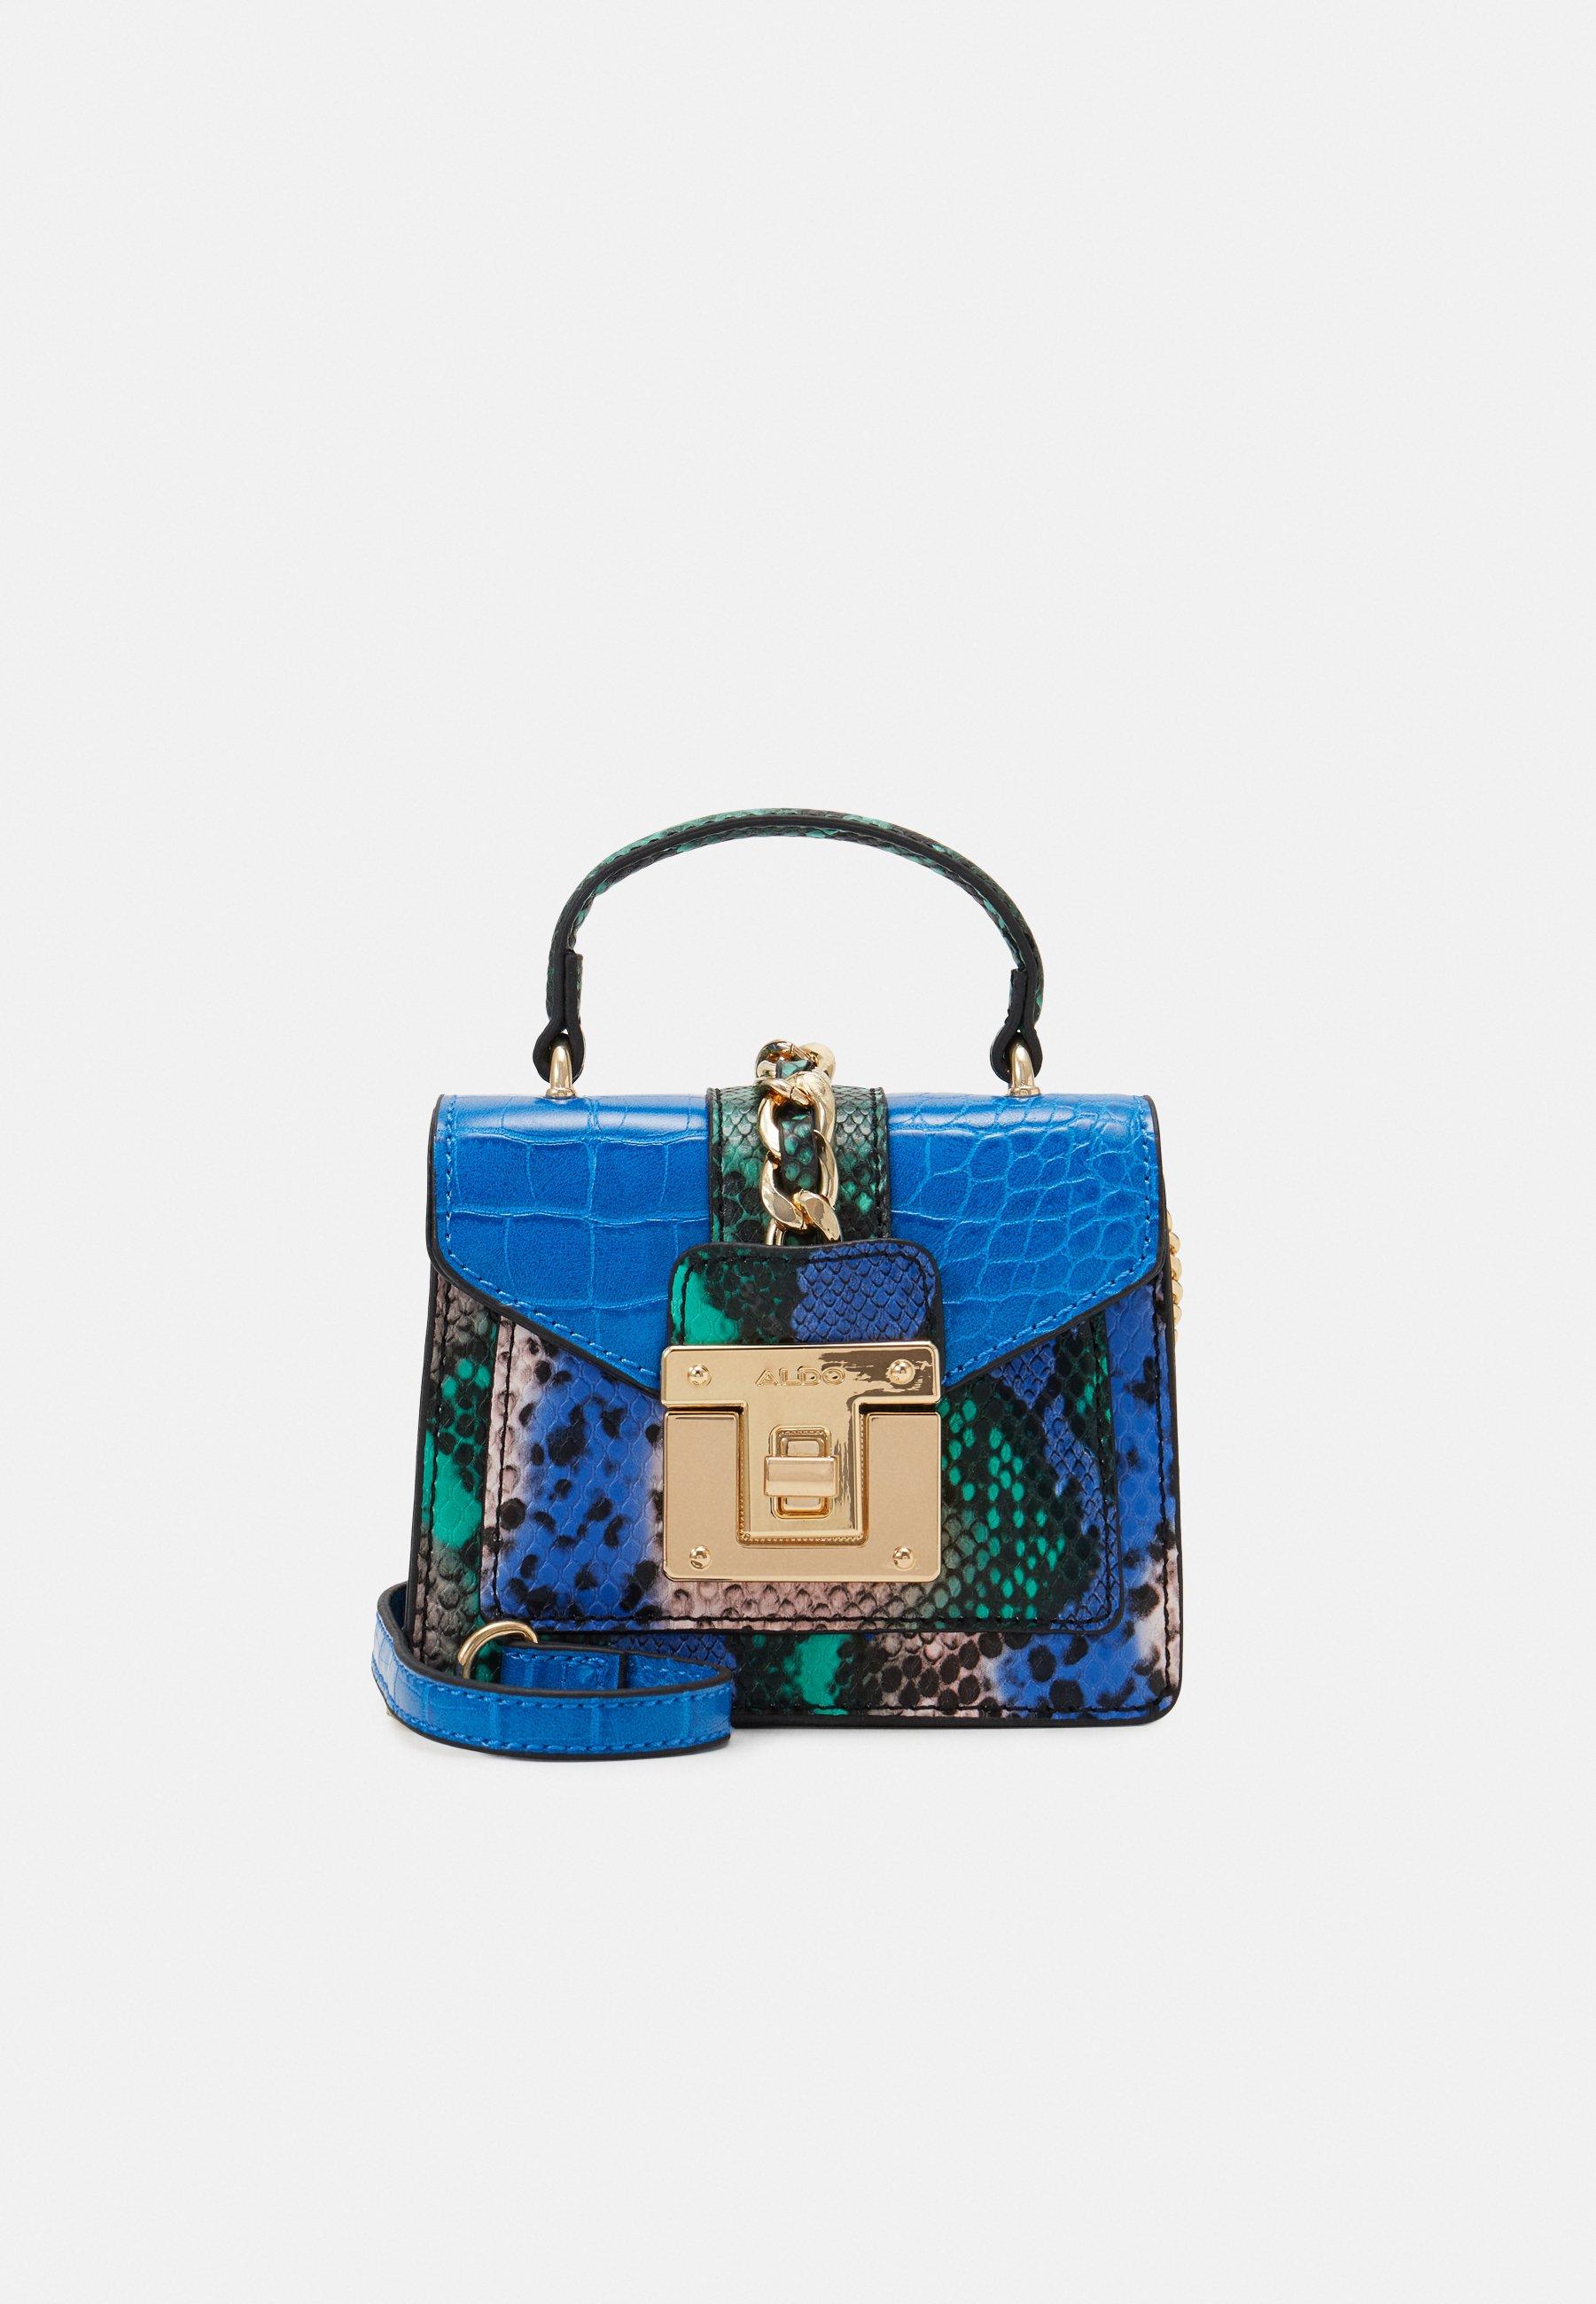 Elegante BORSETTA SHOPPING BAG BORSA DA DONNA Maritim Look Vintage Beige Blu Donna